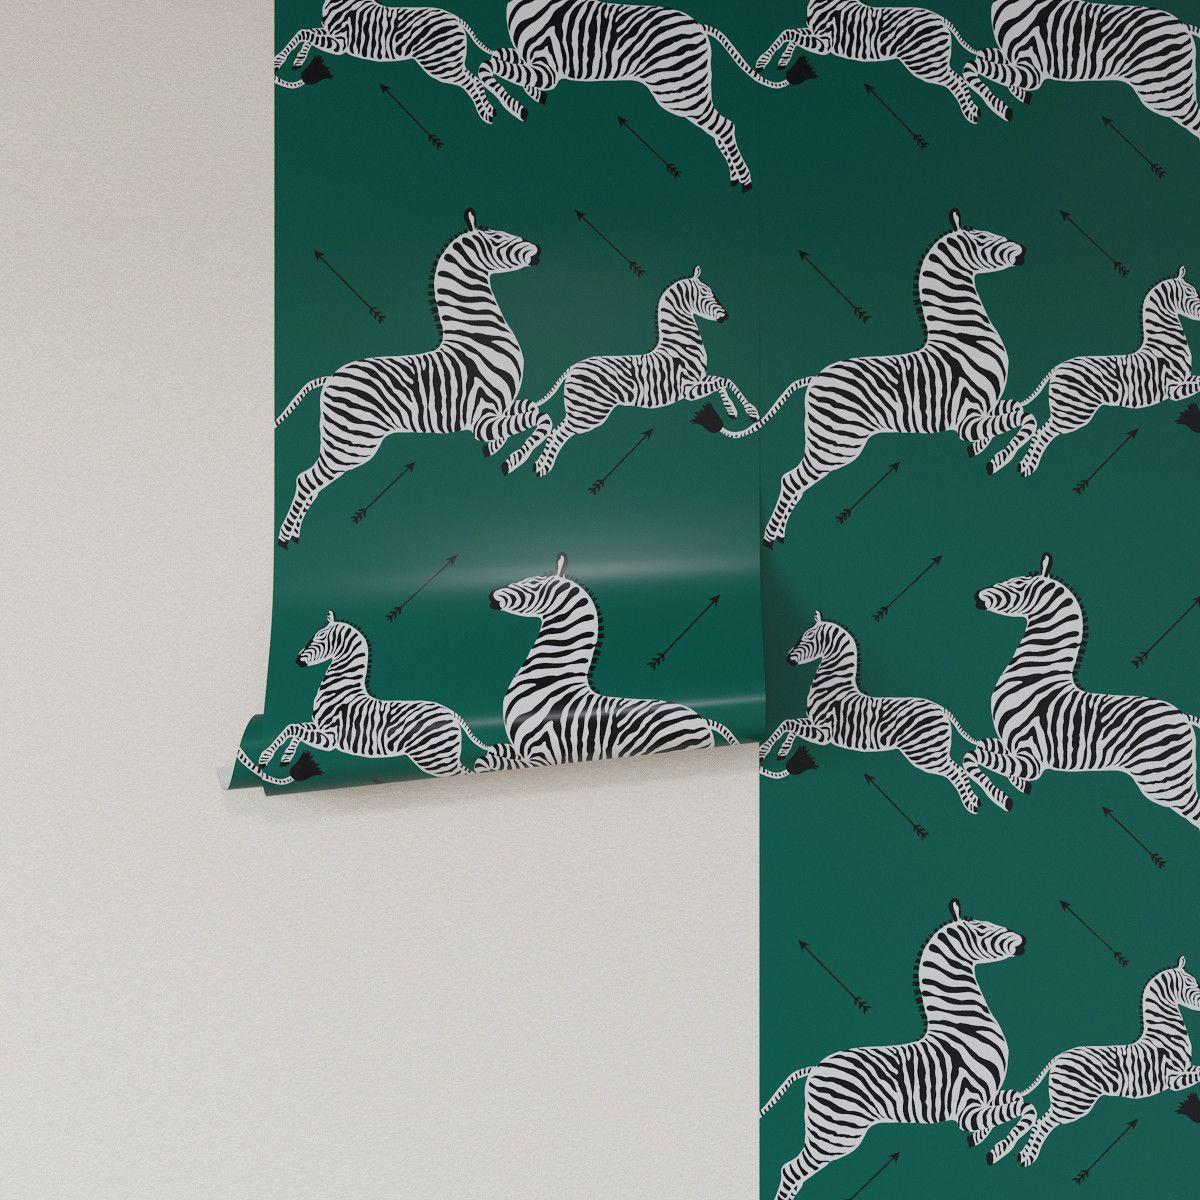 Emerald Zebra Upholstered Custom Peel And Stick Wallpaper Roll Peel And Stick Wallpaper Wallpaper Roll Zebra Wallpaper